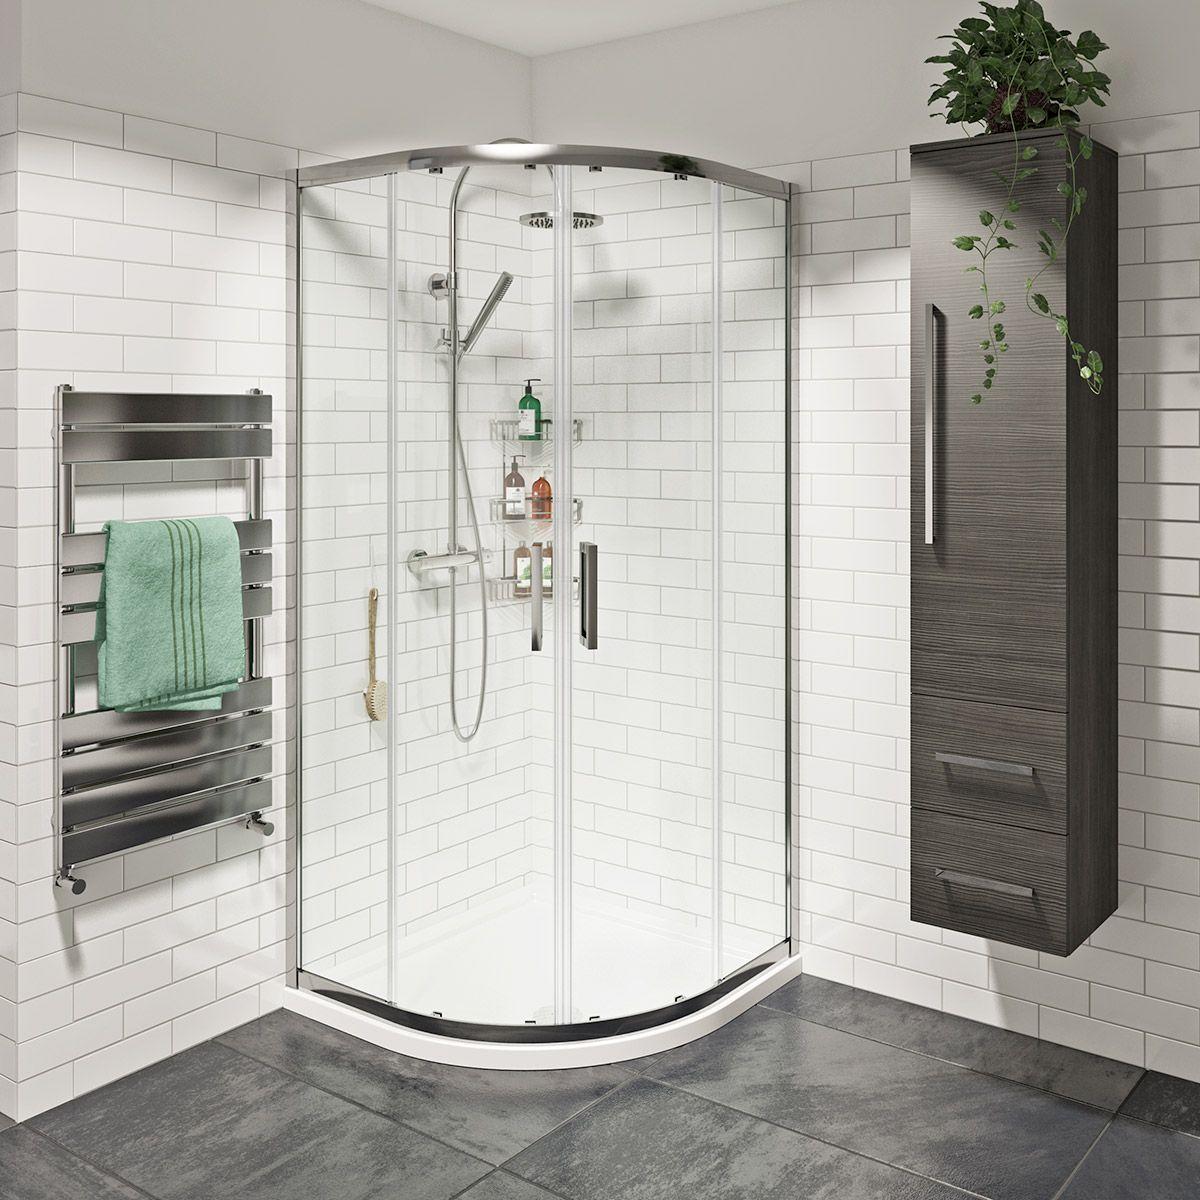 Mode Tate 8mm easy clean sliding quadrant shower enclosure ...